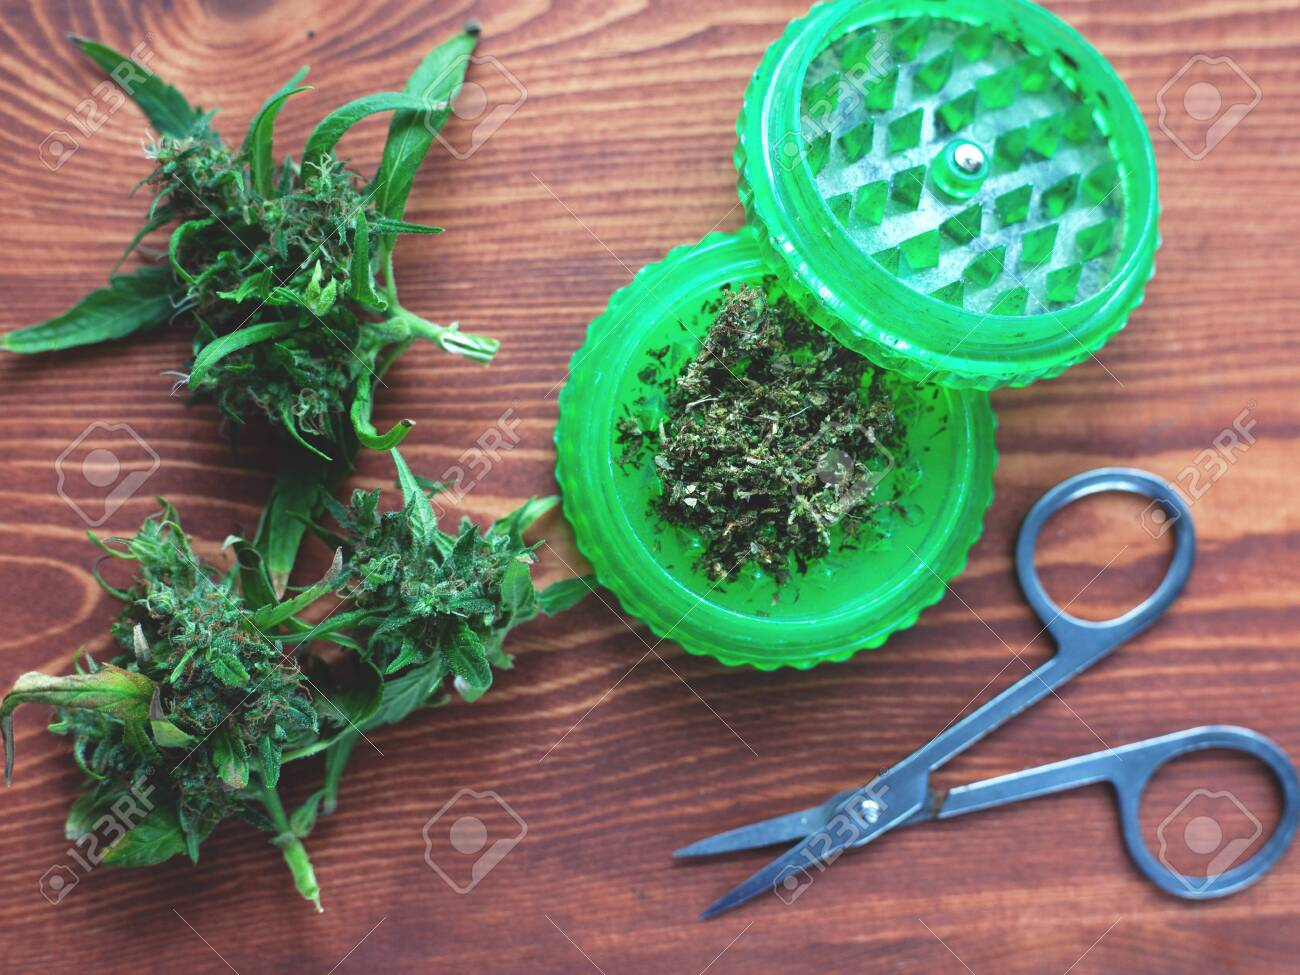 accessories for smoking marijuana on wooden background sativa